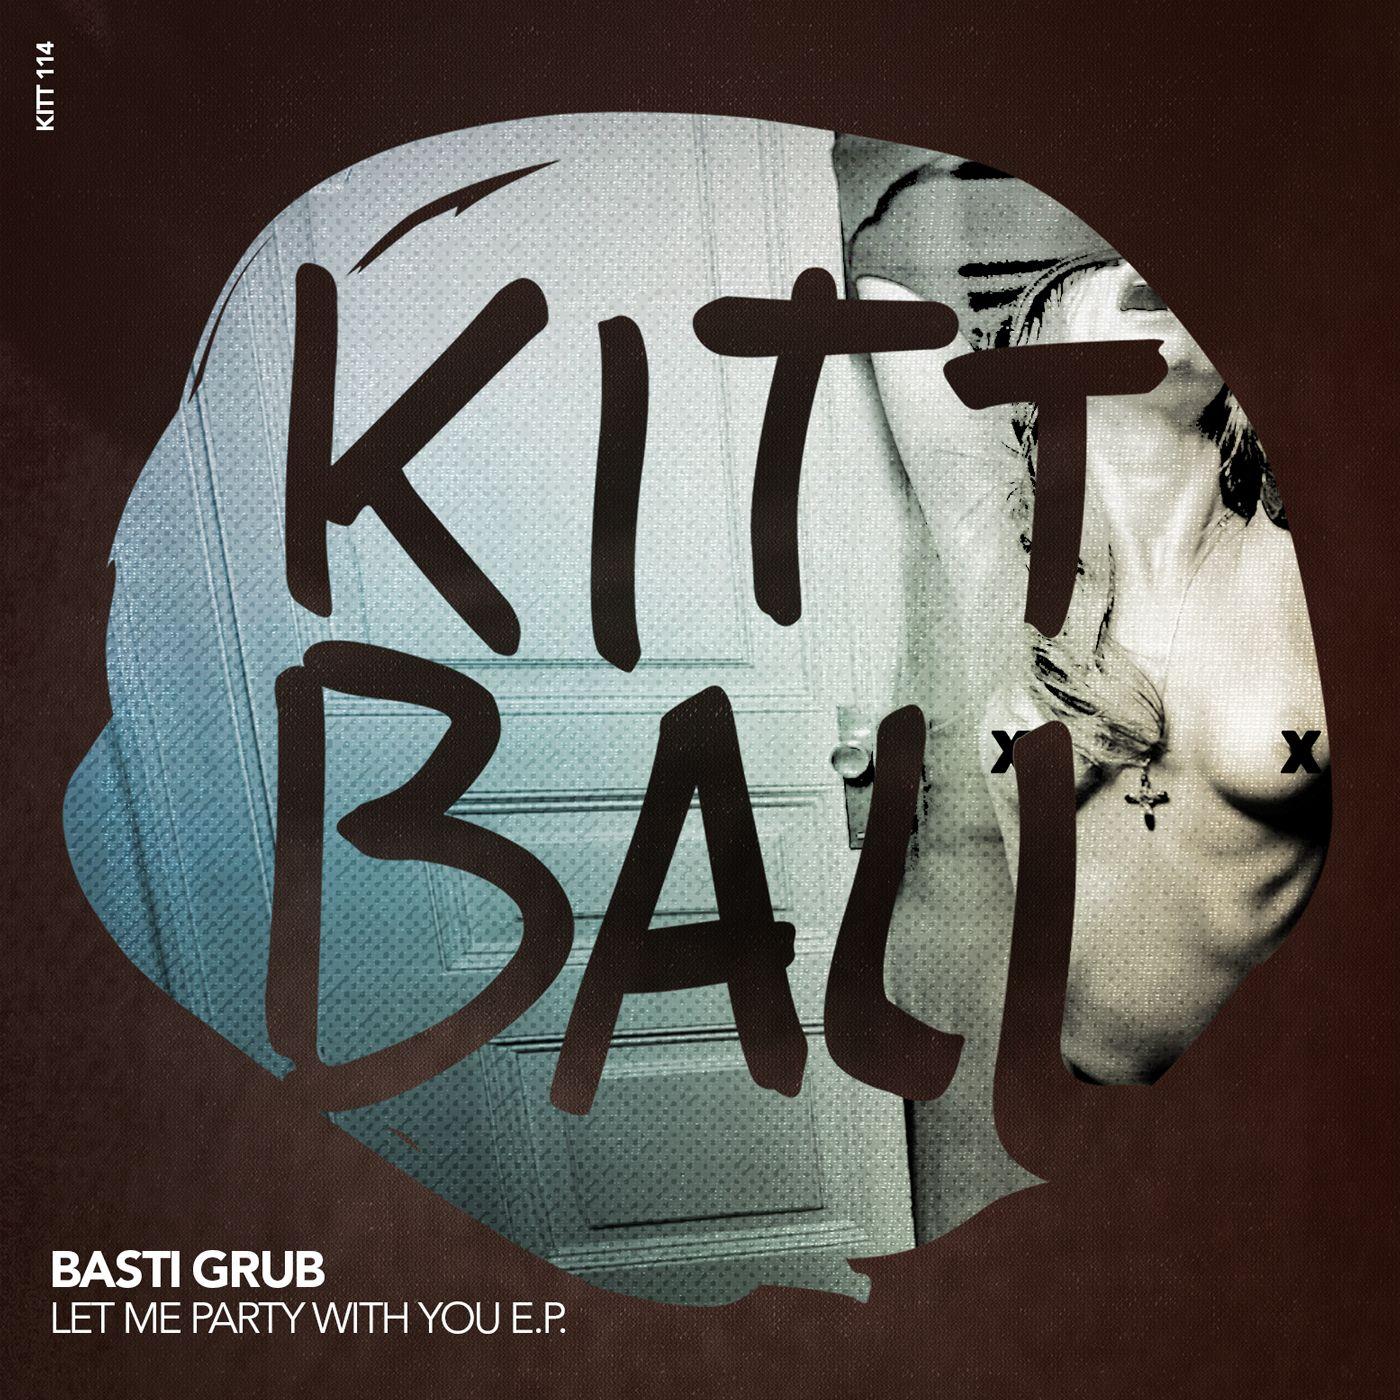 packshot_basti_grub_-_let_me_party_with_you_ep_-_kittball_records.jpg